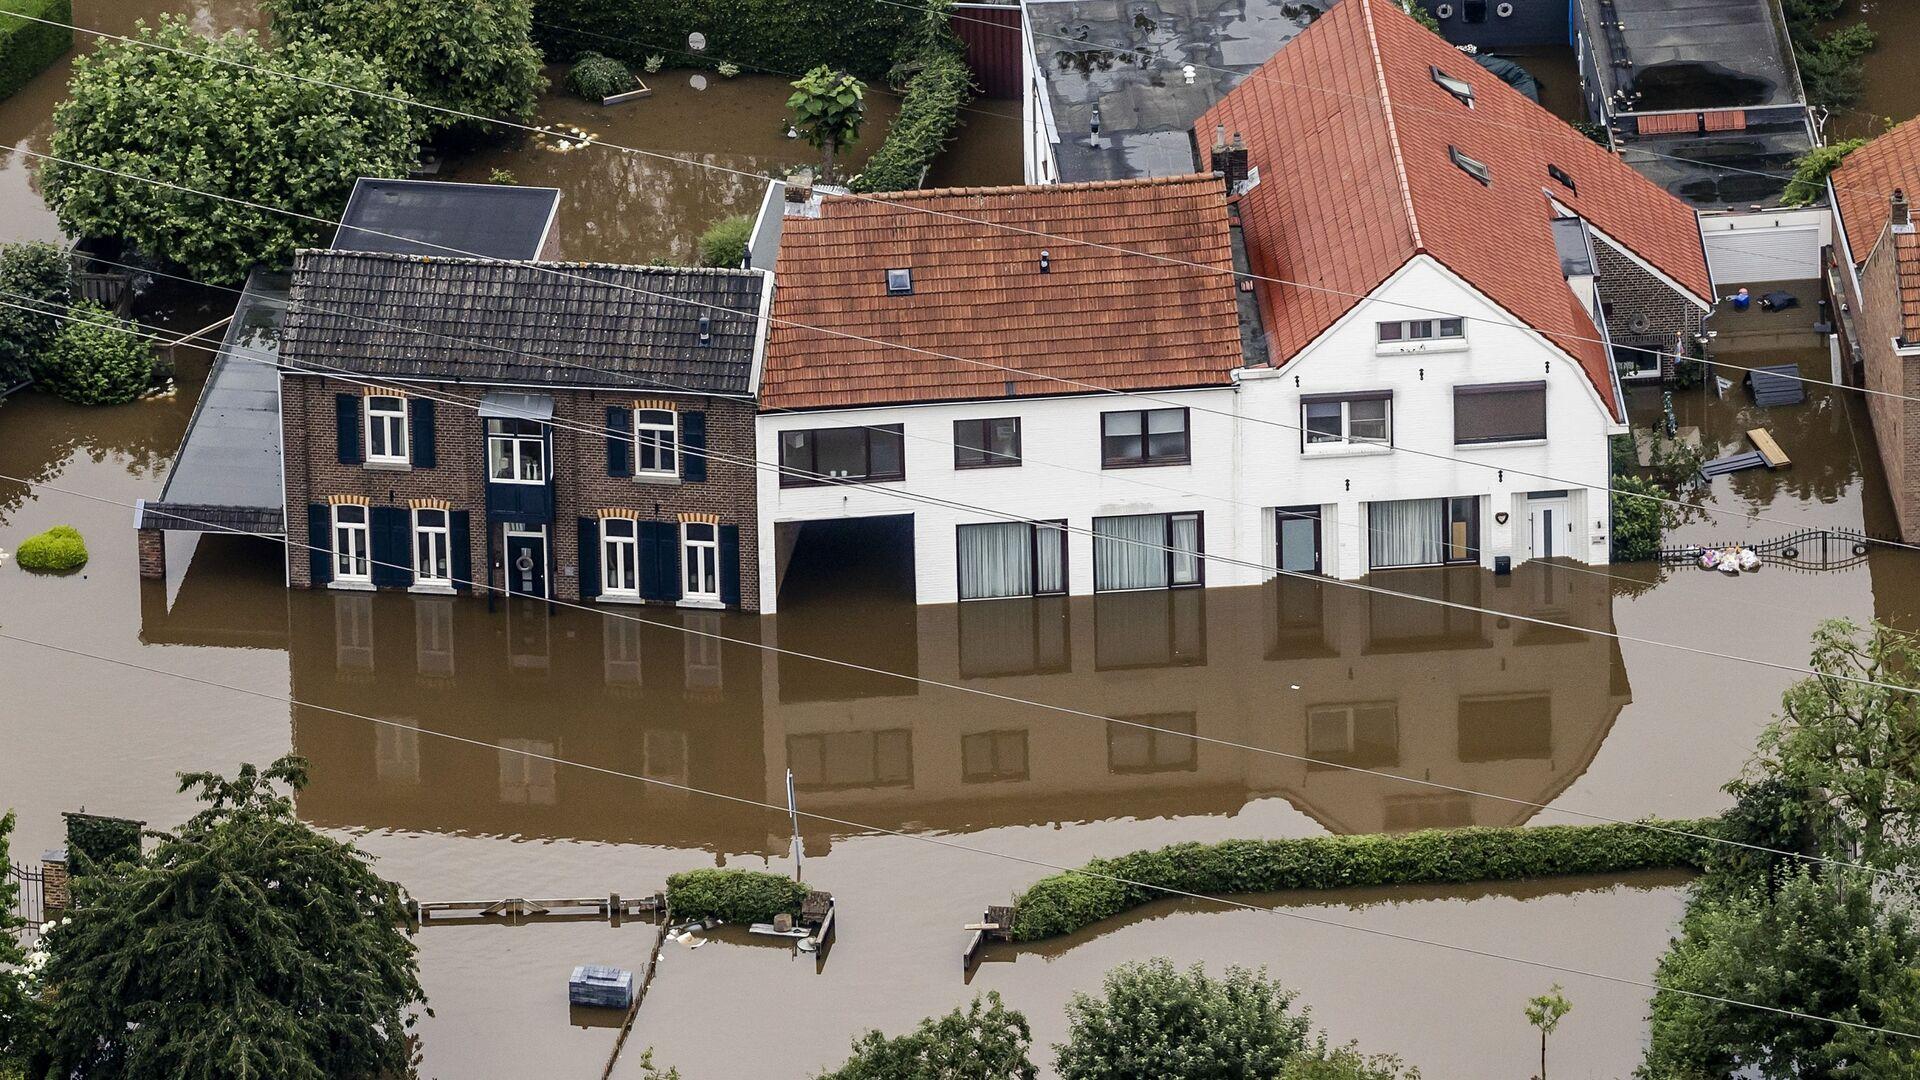 Powódź w Valkenburgu, Niderlandy - Sputnik Polska, 1920, 21.07.2021